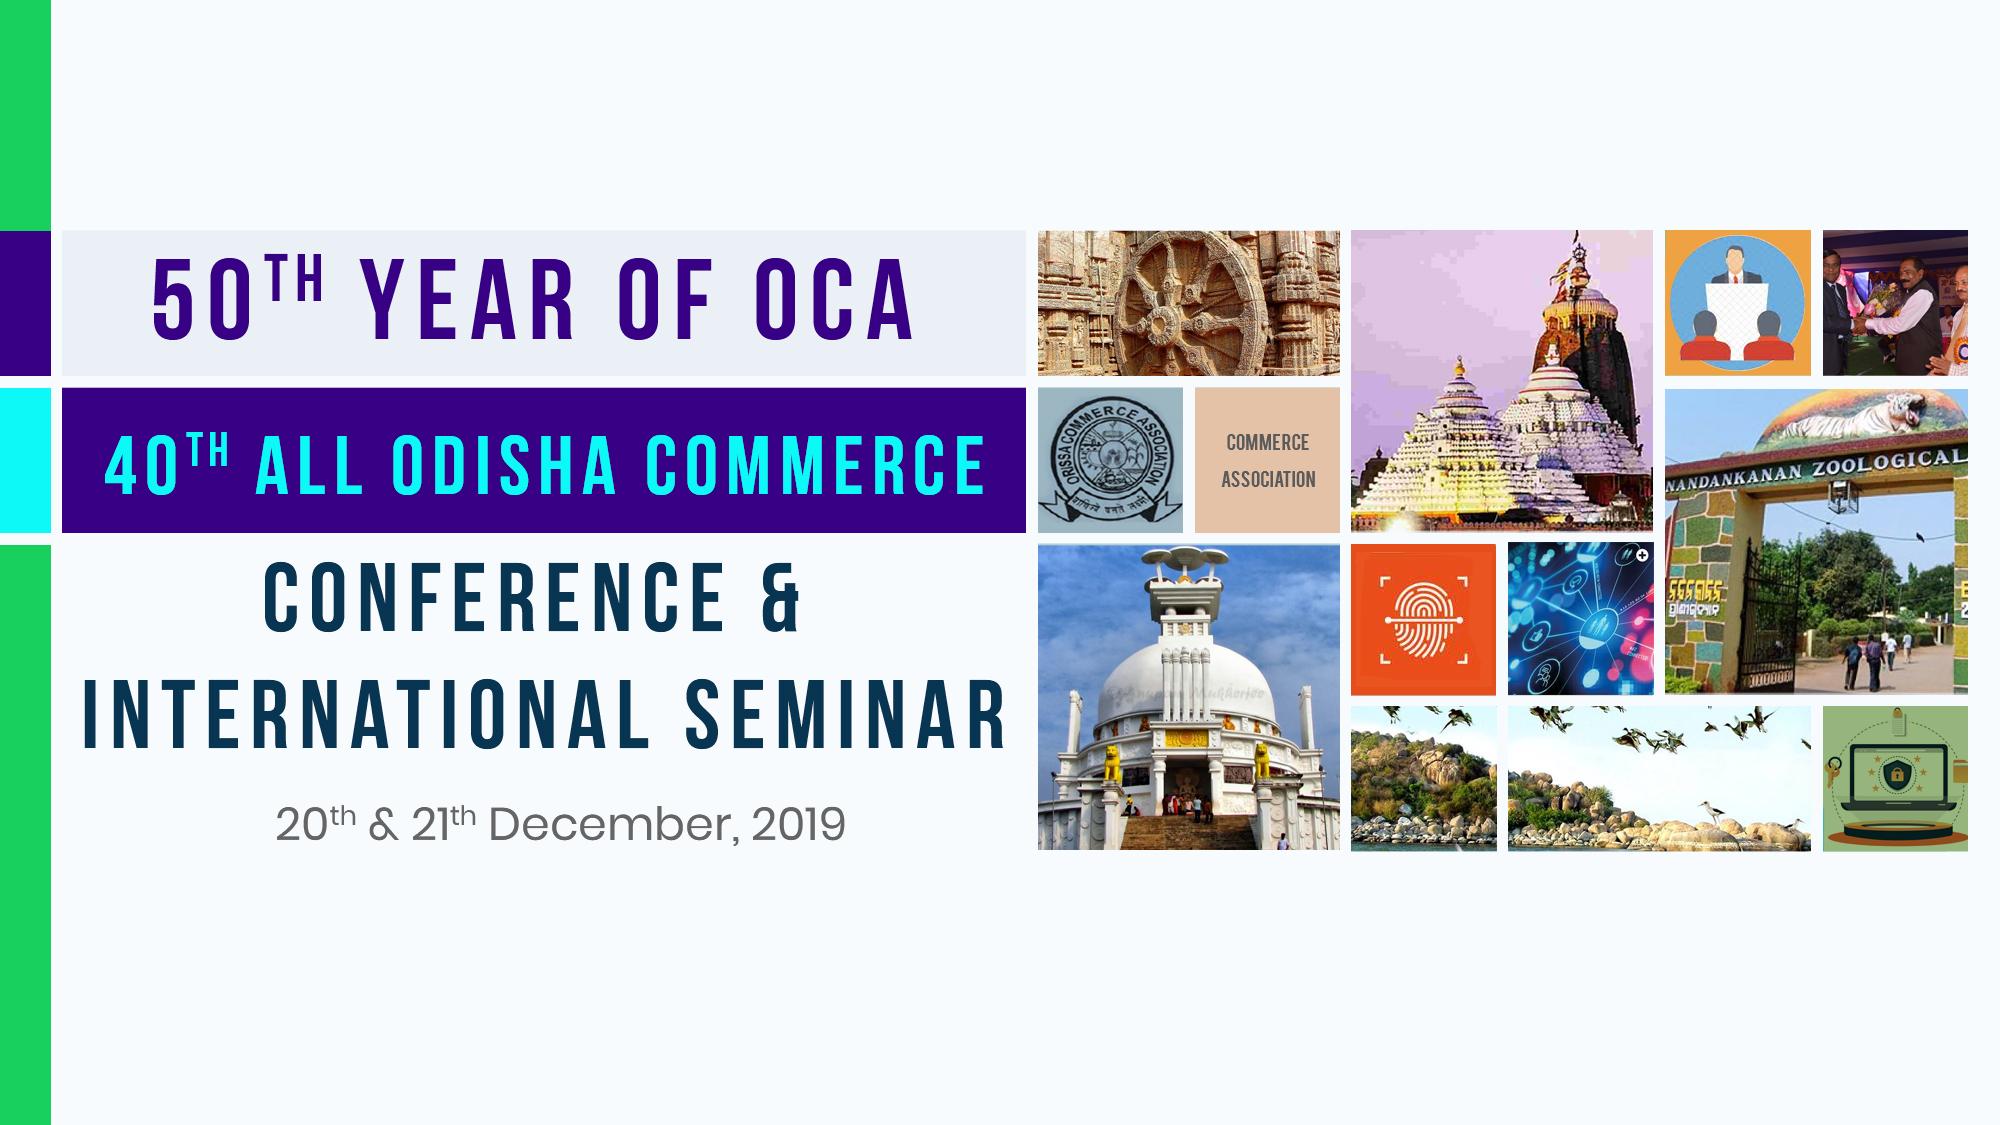 All Odisha Commerce Conference-2019